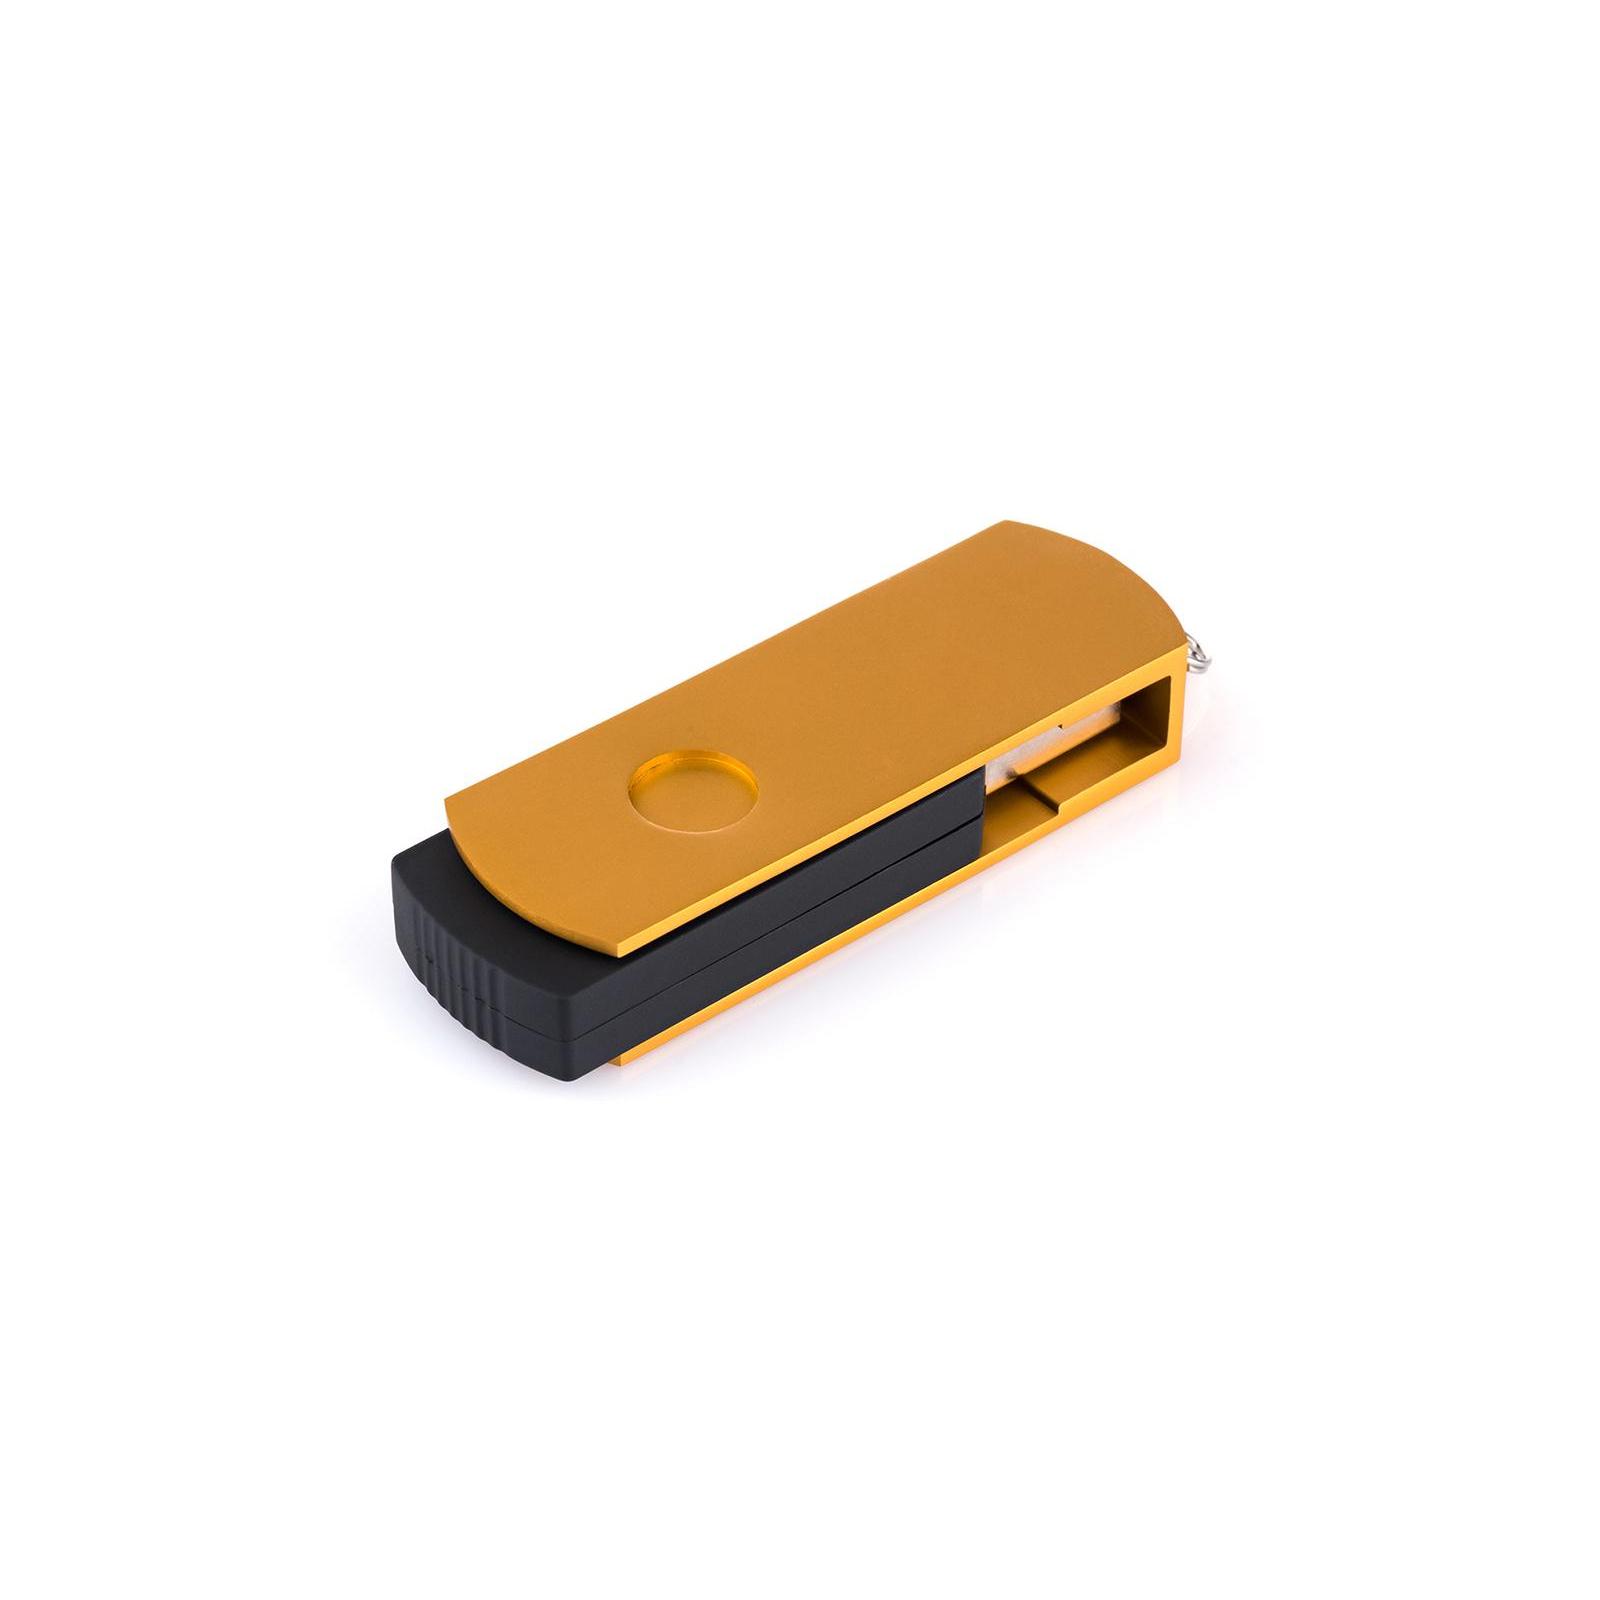 USB флеш накопитель eXceleram 16GB P2 Series Gold/Black USB 3.1 Gen 1 (EXP2U3GOB16) изображение 6